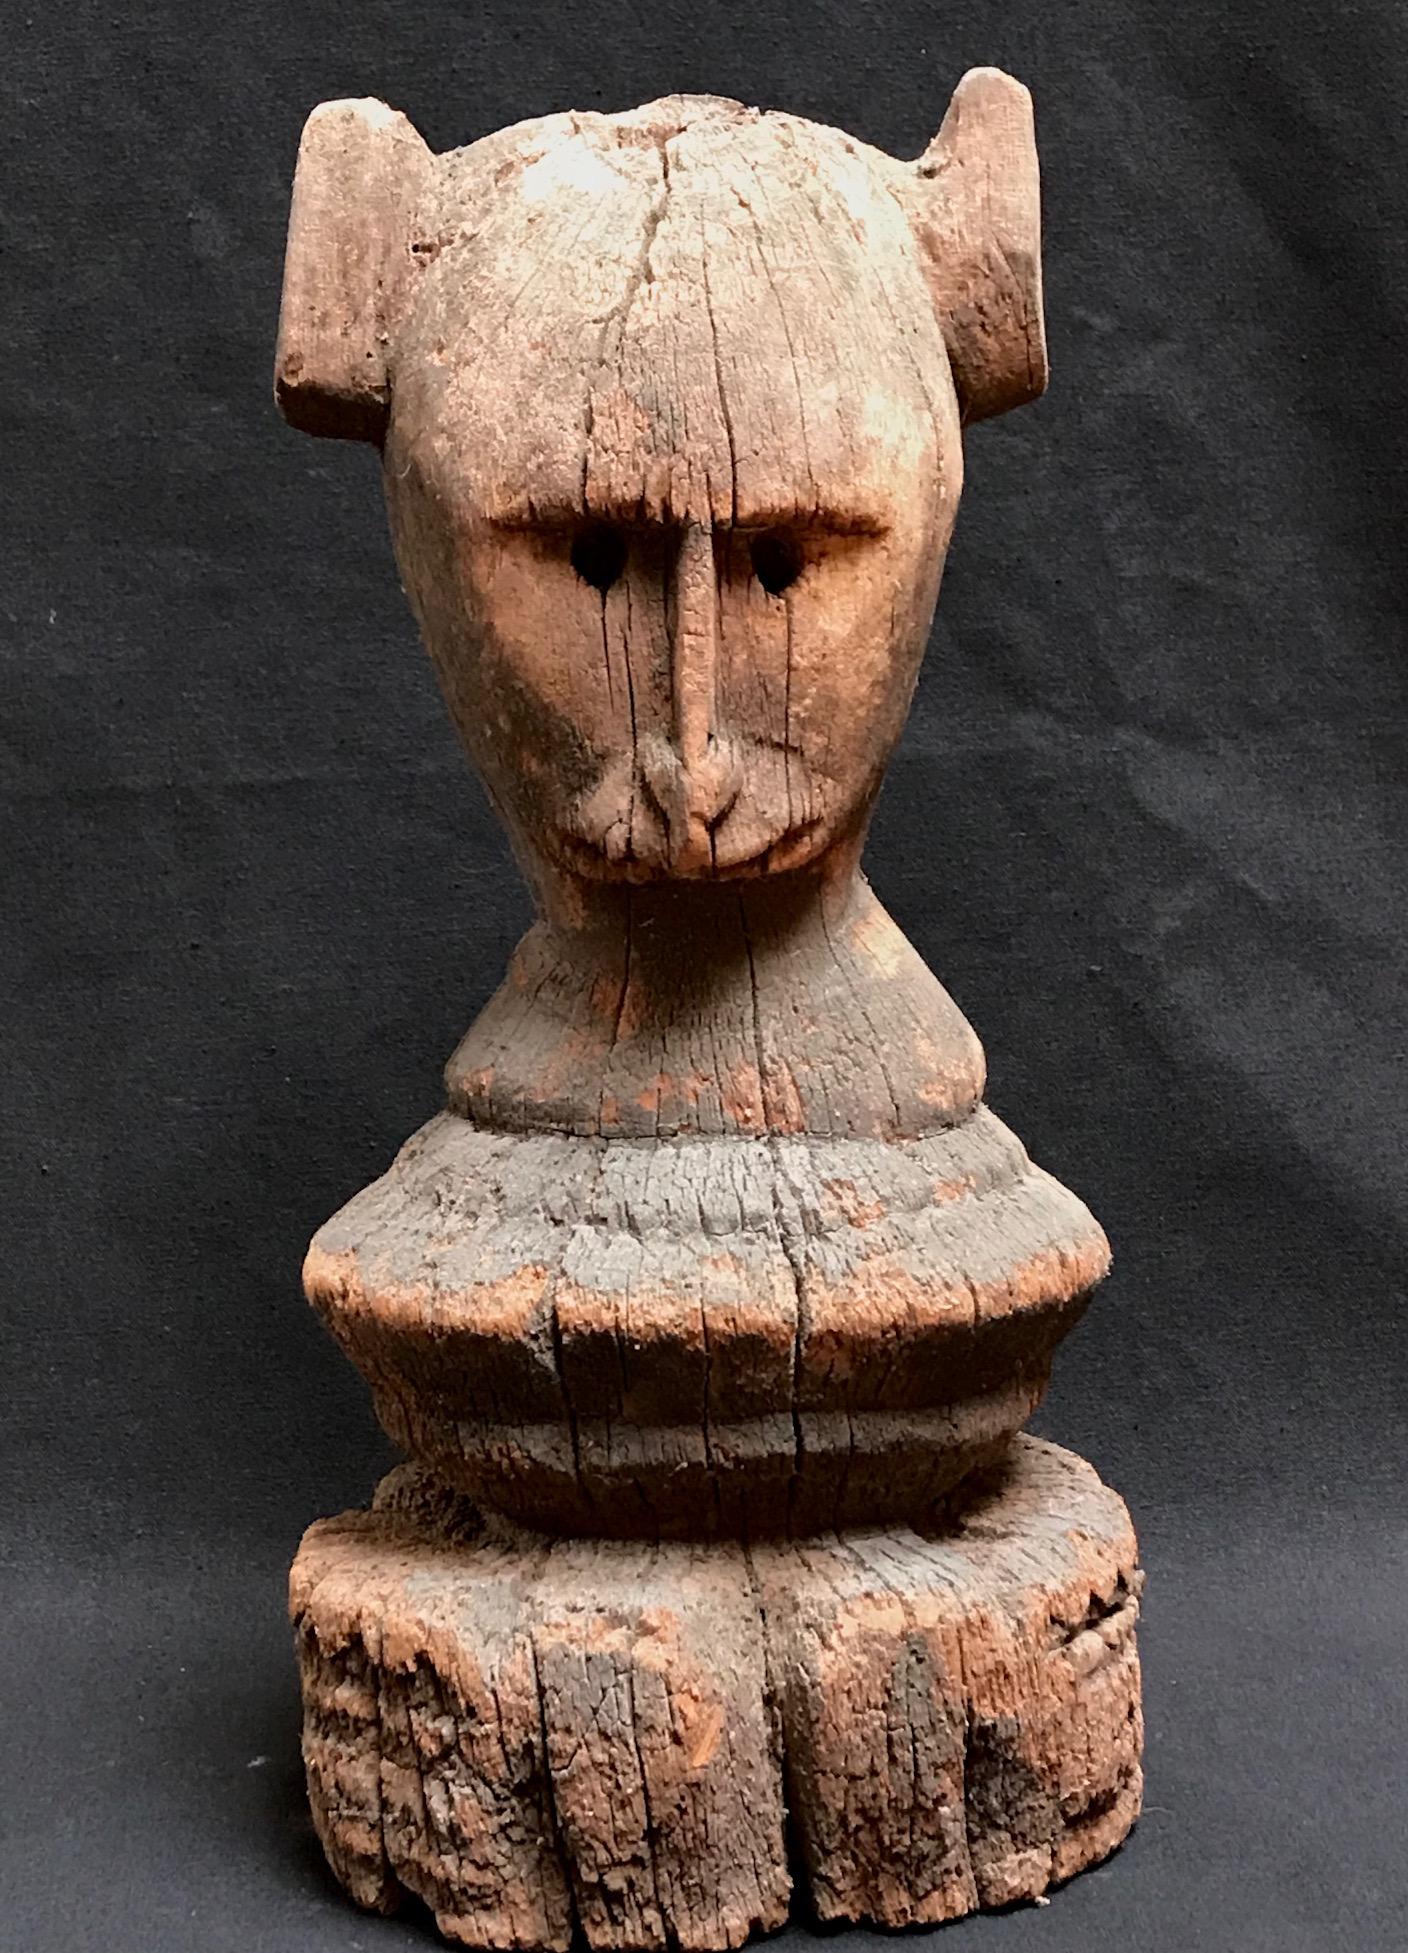 "Shaman healing object, from near Kodi village, West Sumba Island, Indonesia, mid 20th c., jack fruit wood, 11 1/2"" x 6"" x 5"","